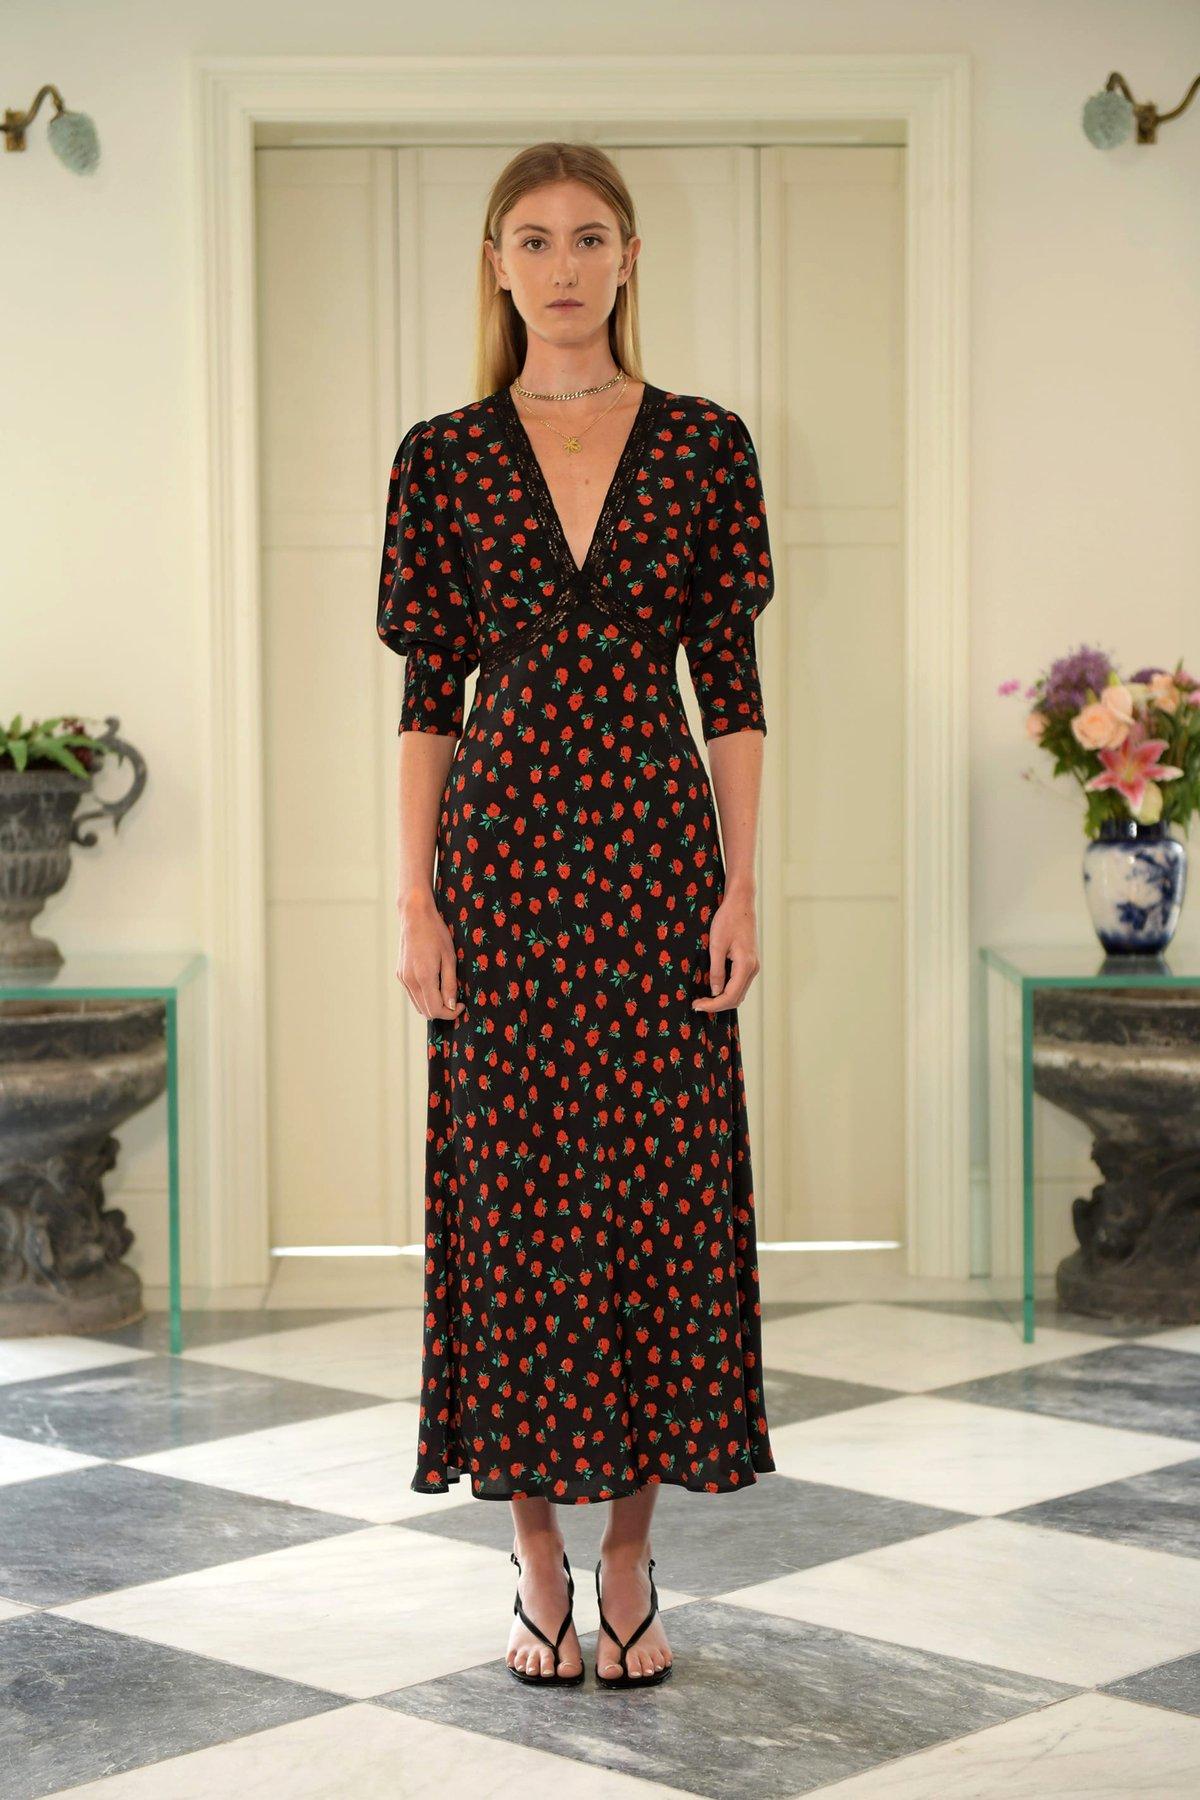 GEMMA VINTAGE ROSE - BLACK by Rixo, available on rixo.co.uk for EUR265 Hailey Baldwin Dress Exact Product